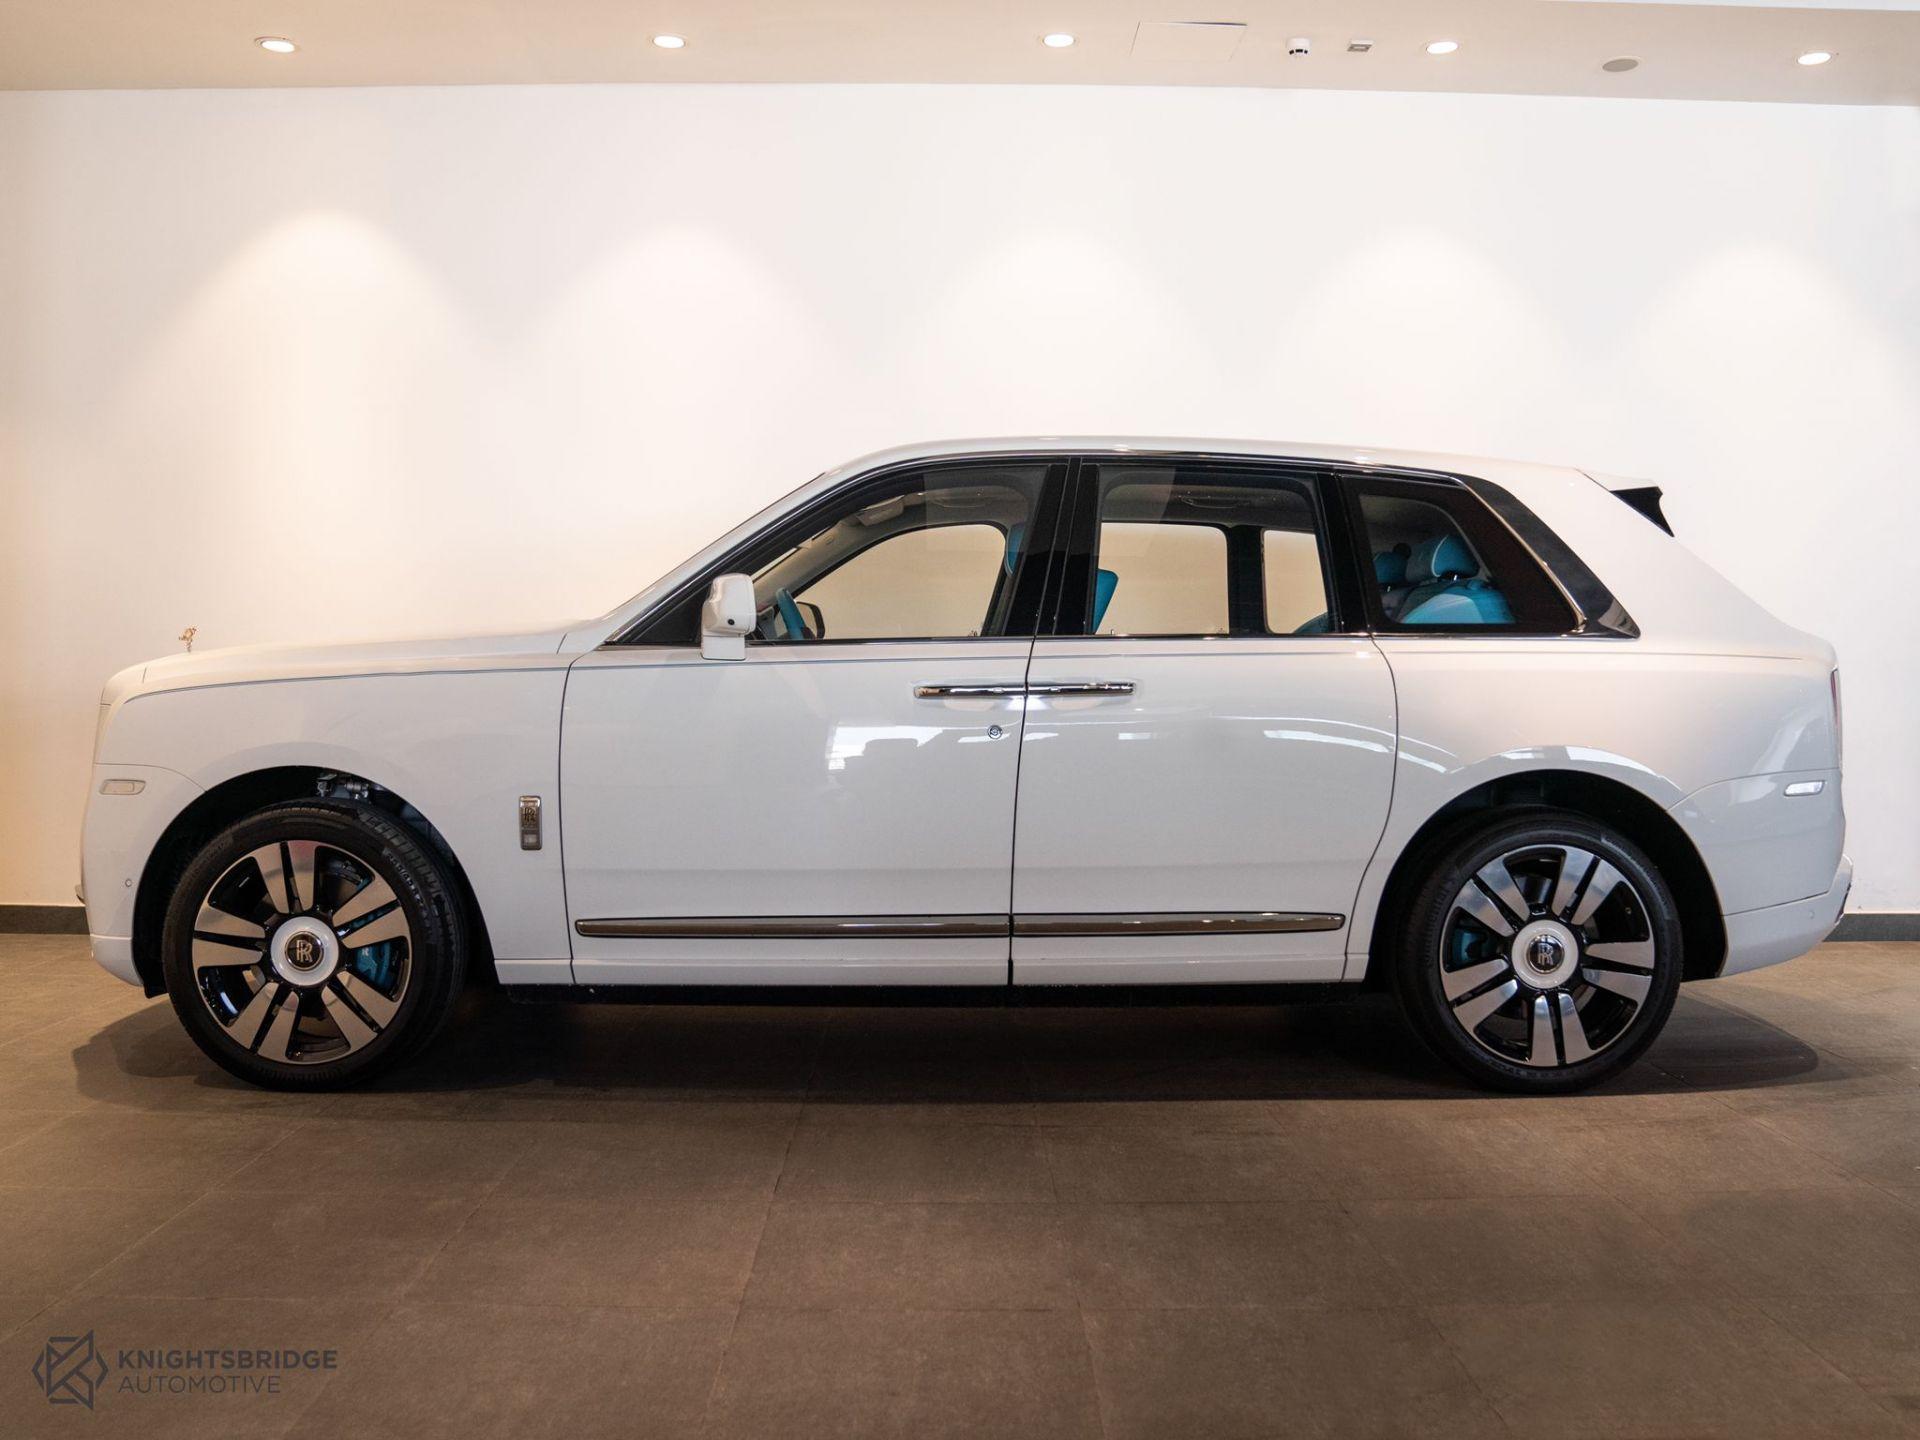 2021 Rolls-Royce Cullinan at Knightsbridge Automotive - (10061 - 3)